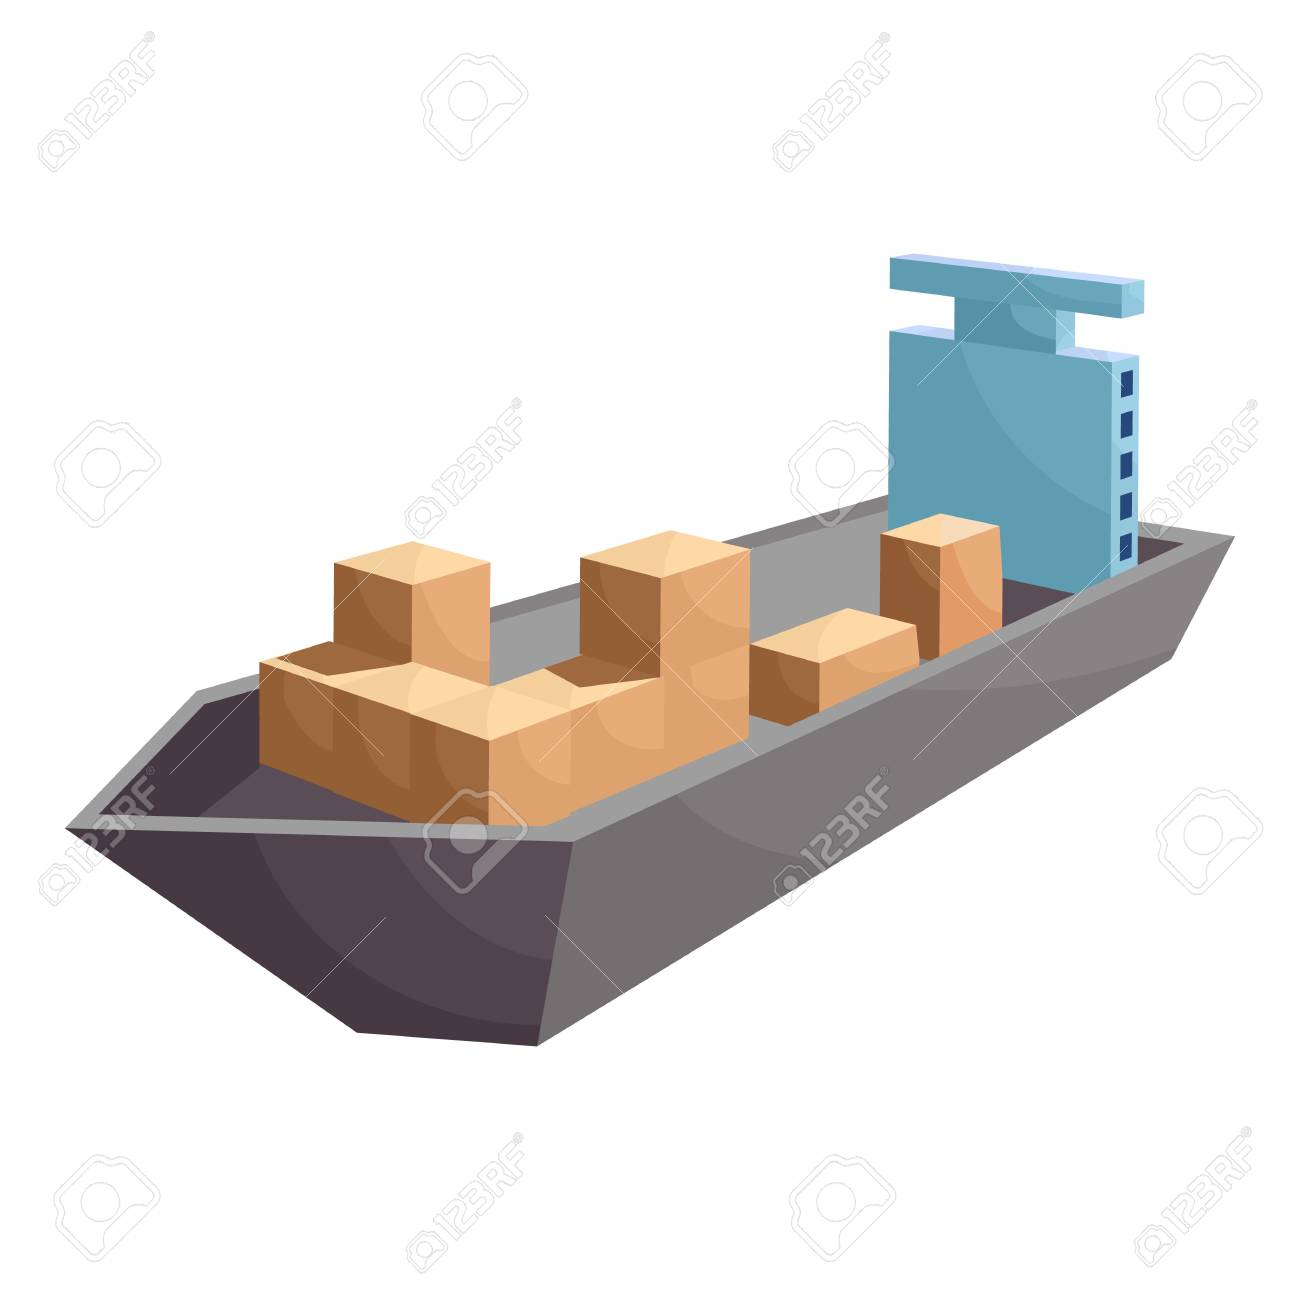 hight resolution of cargo ship icon cartoon style stock photo 106779272